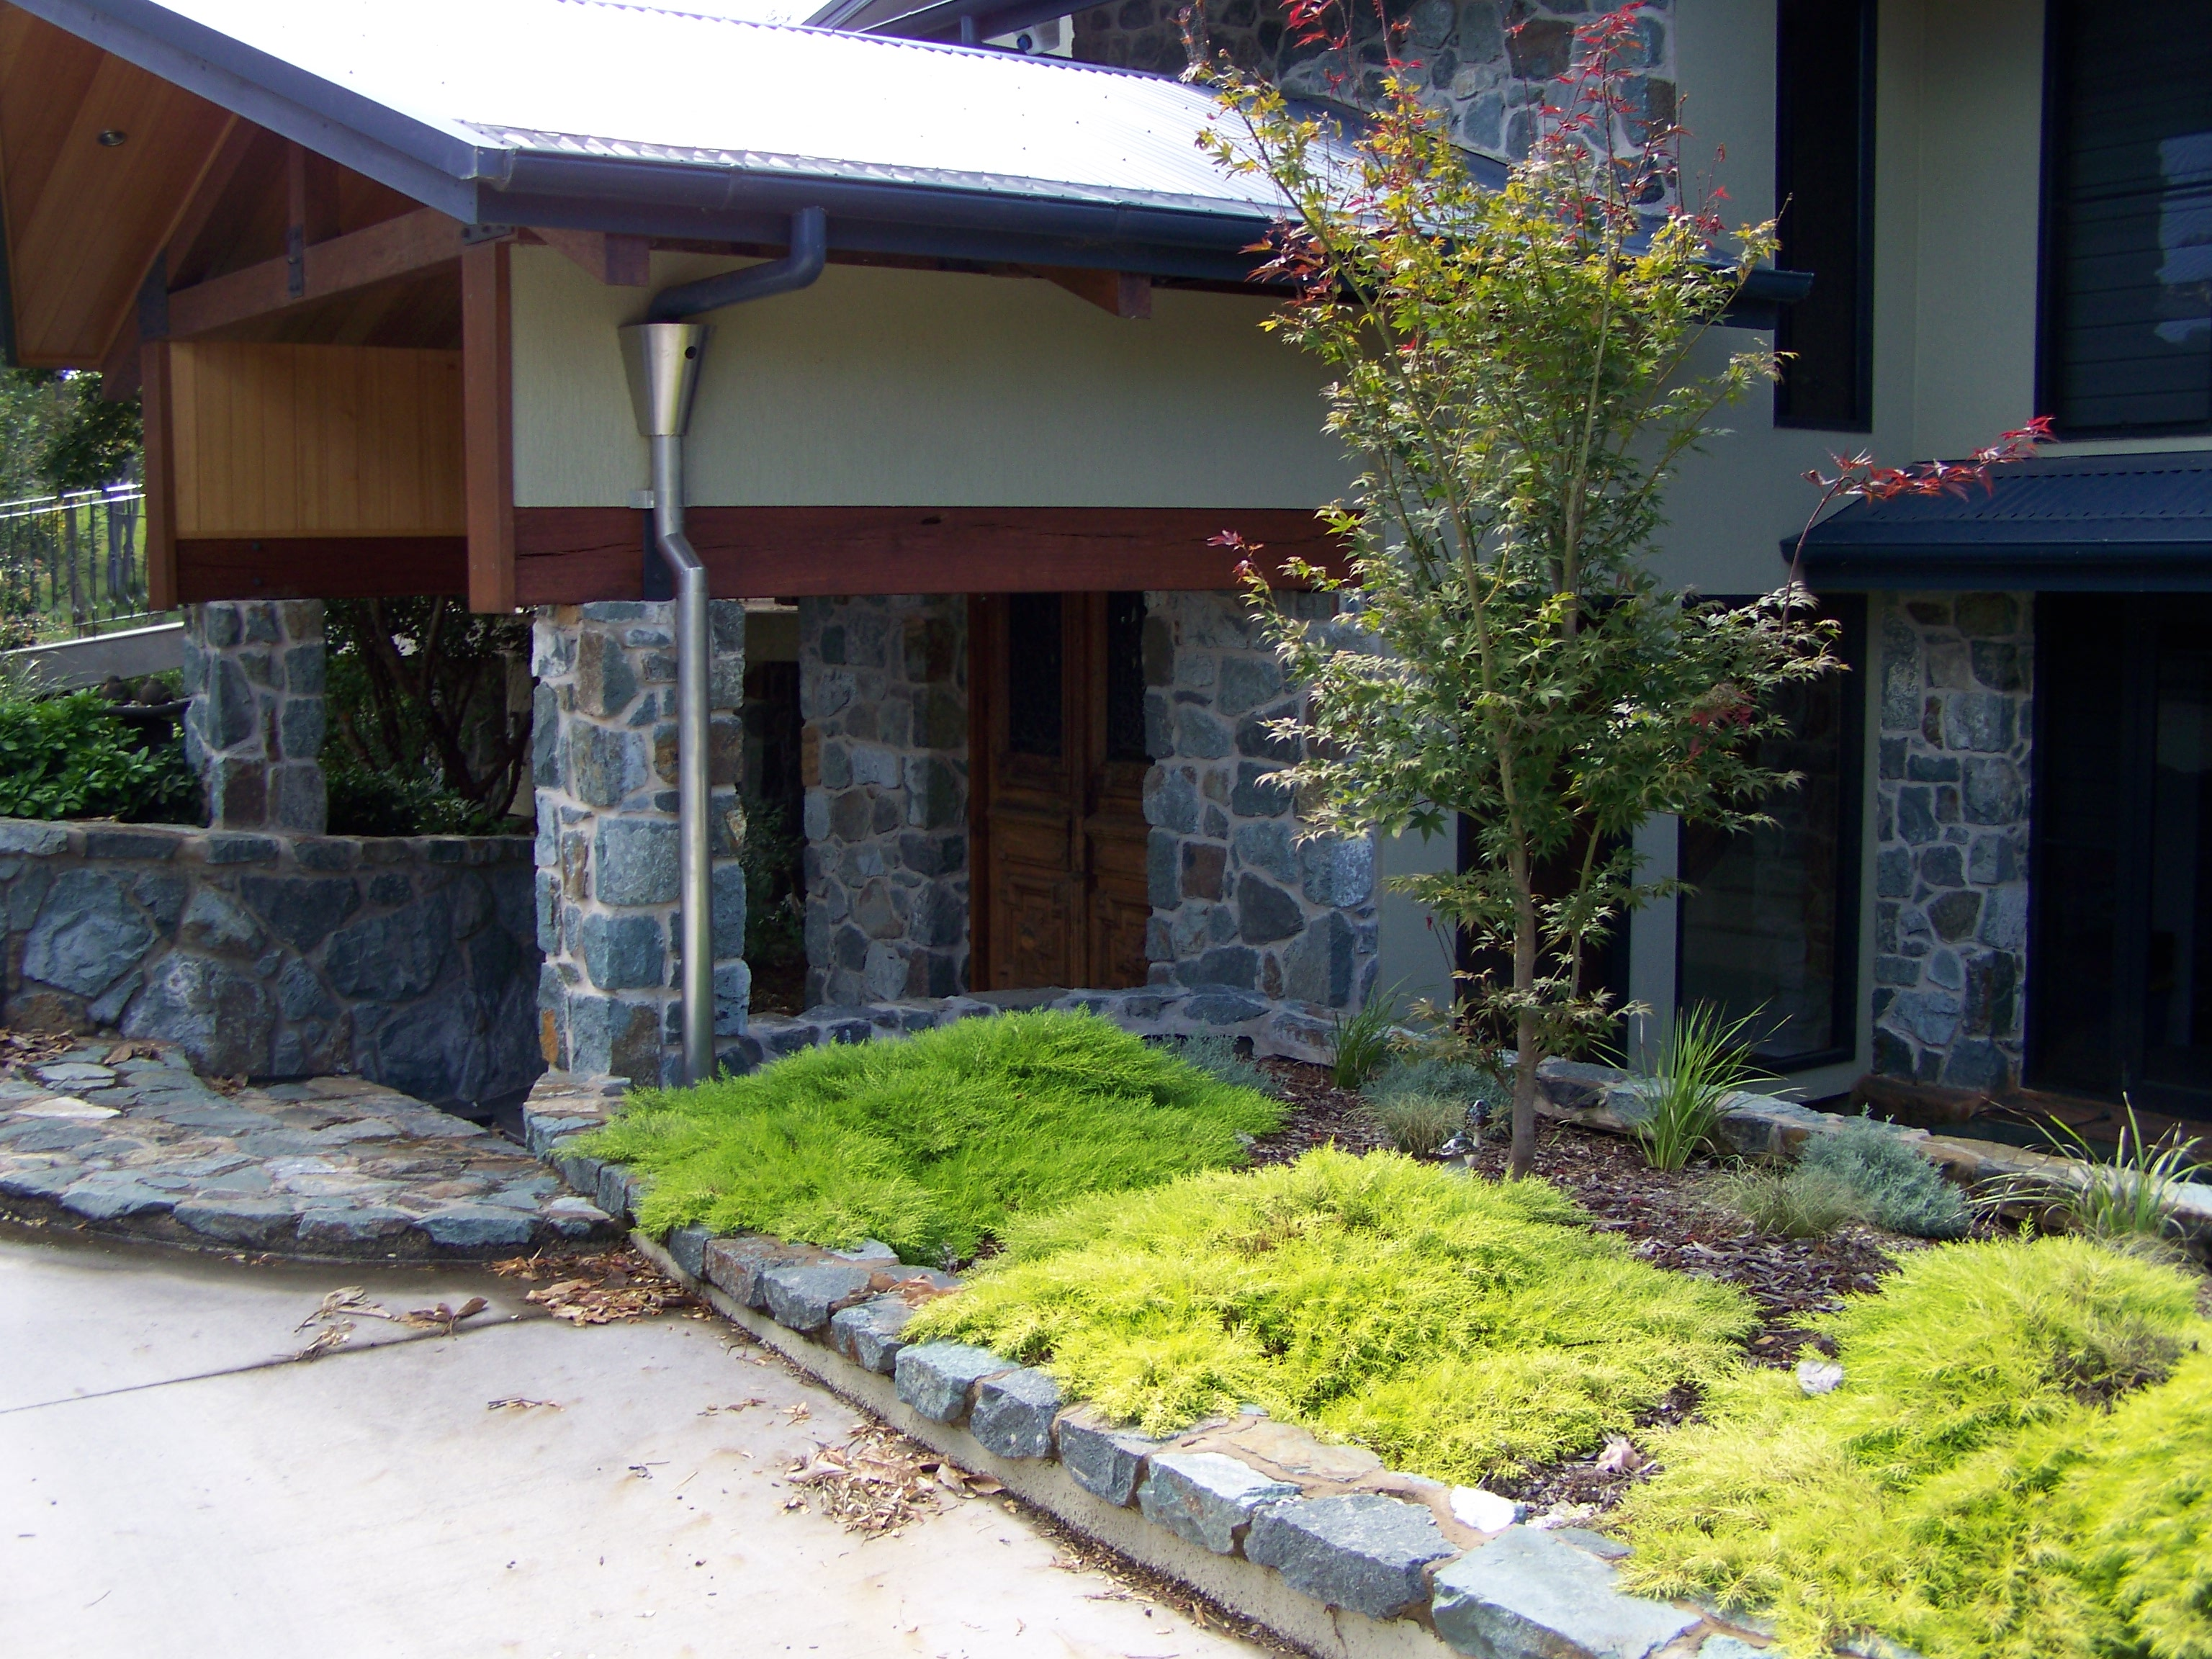 Basalt Stone Structure